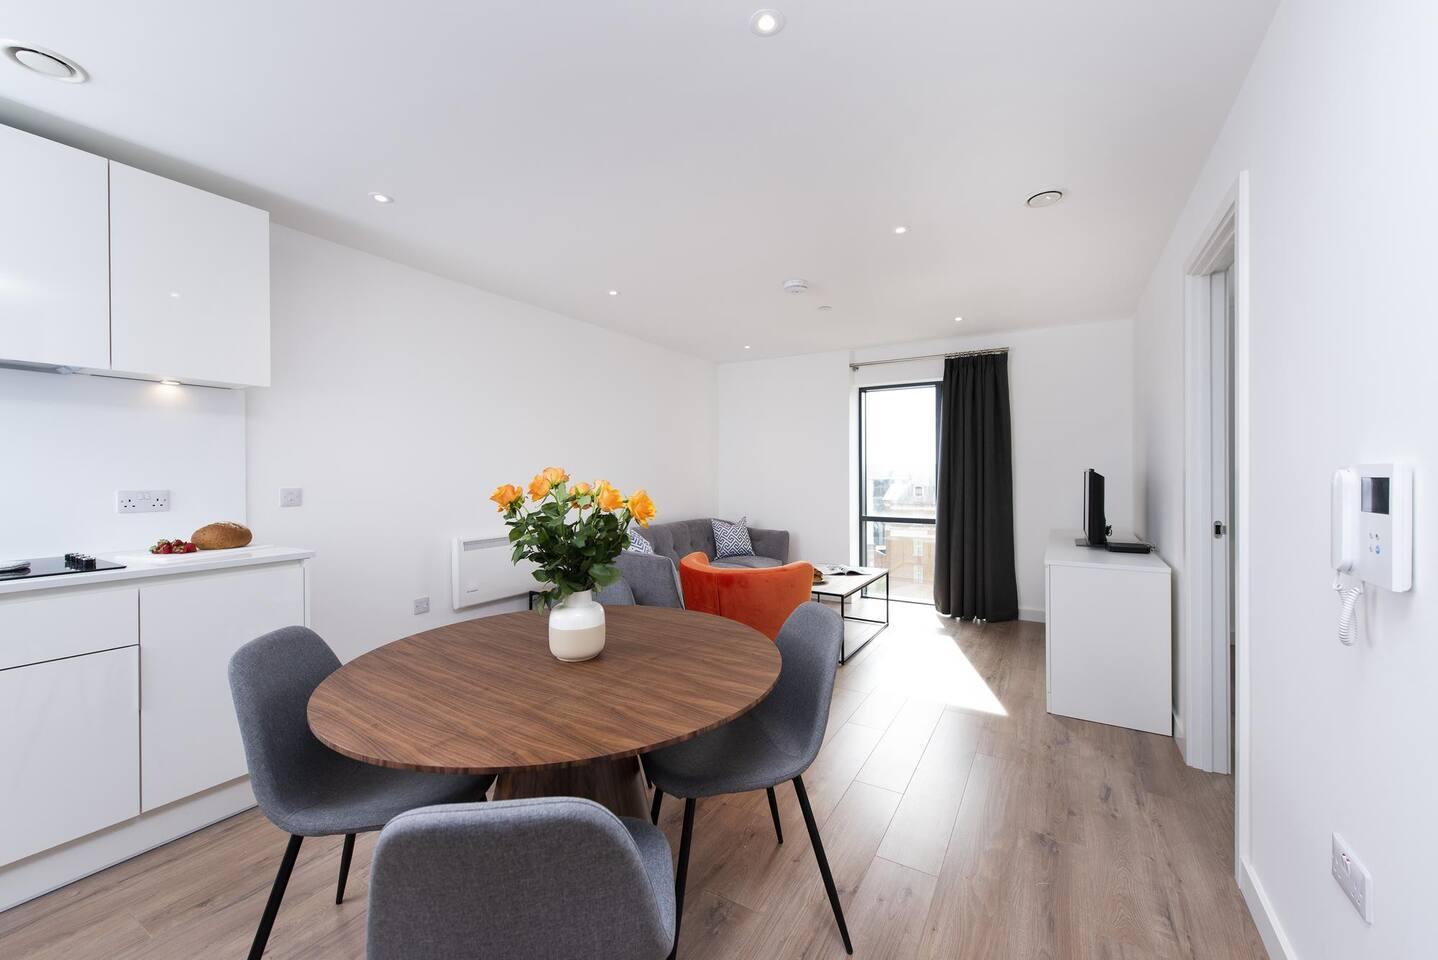 Dining area at The Lansdowne Apartments, Ladywood, Birmingham